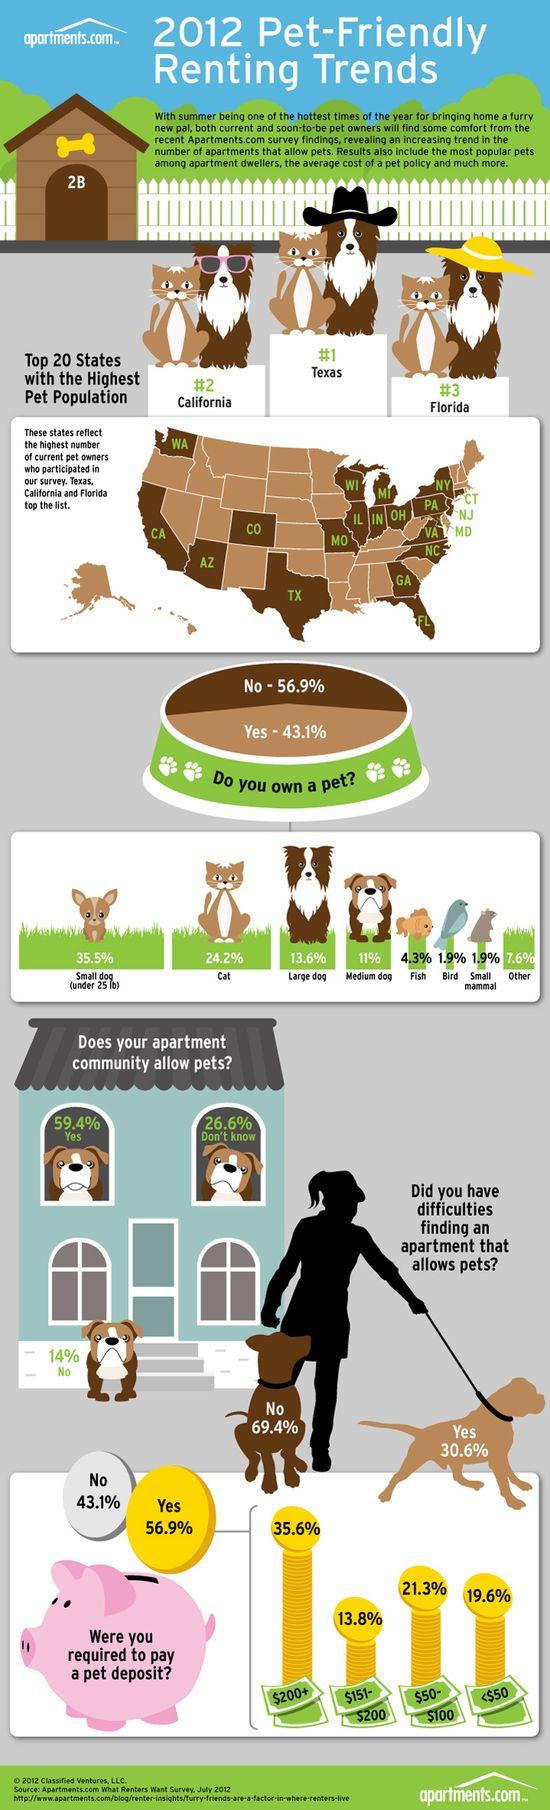 Infographic: Pet-friendly apartment living